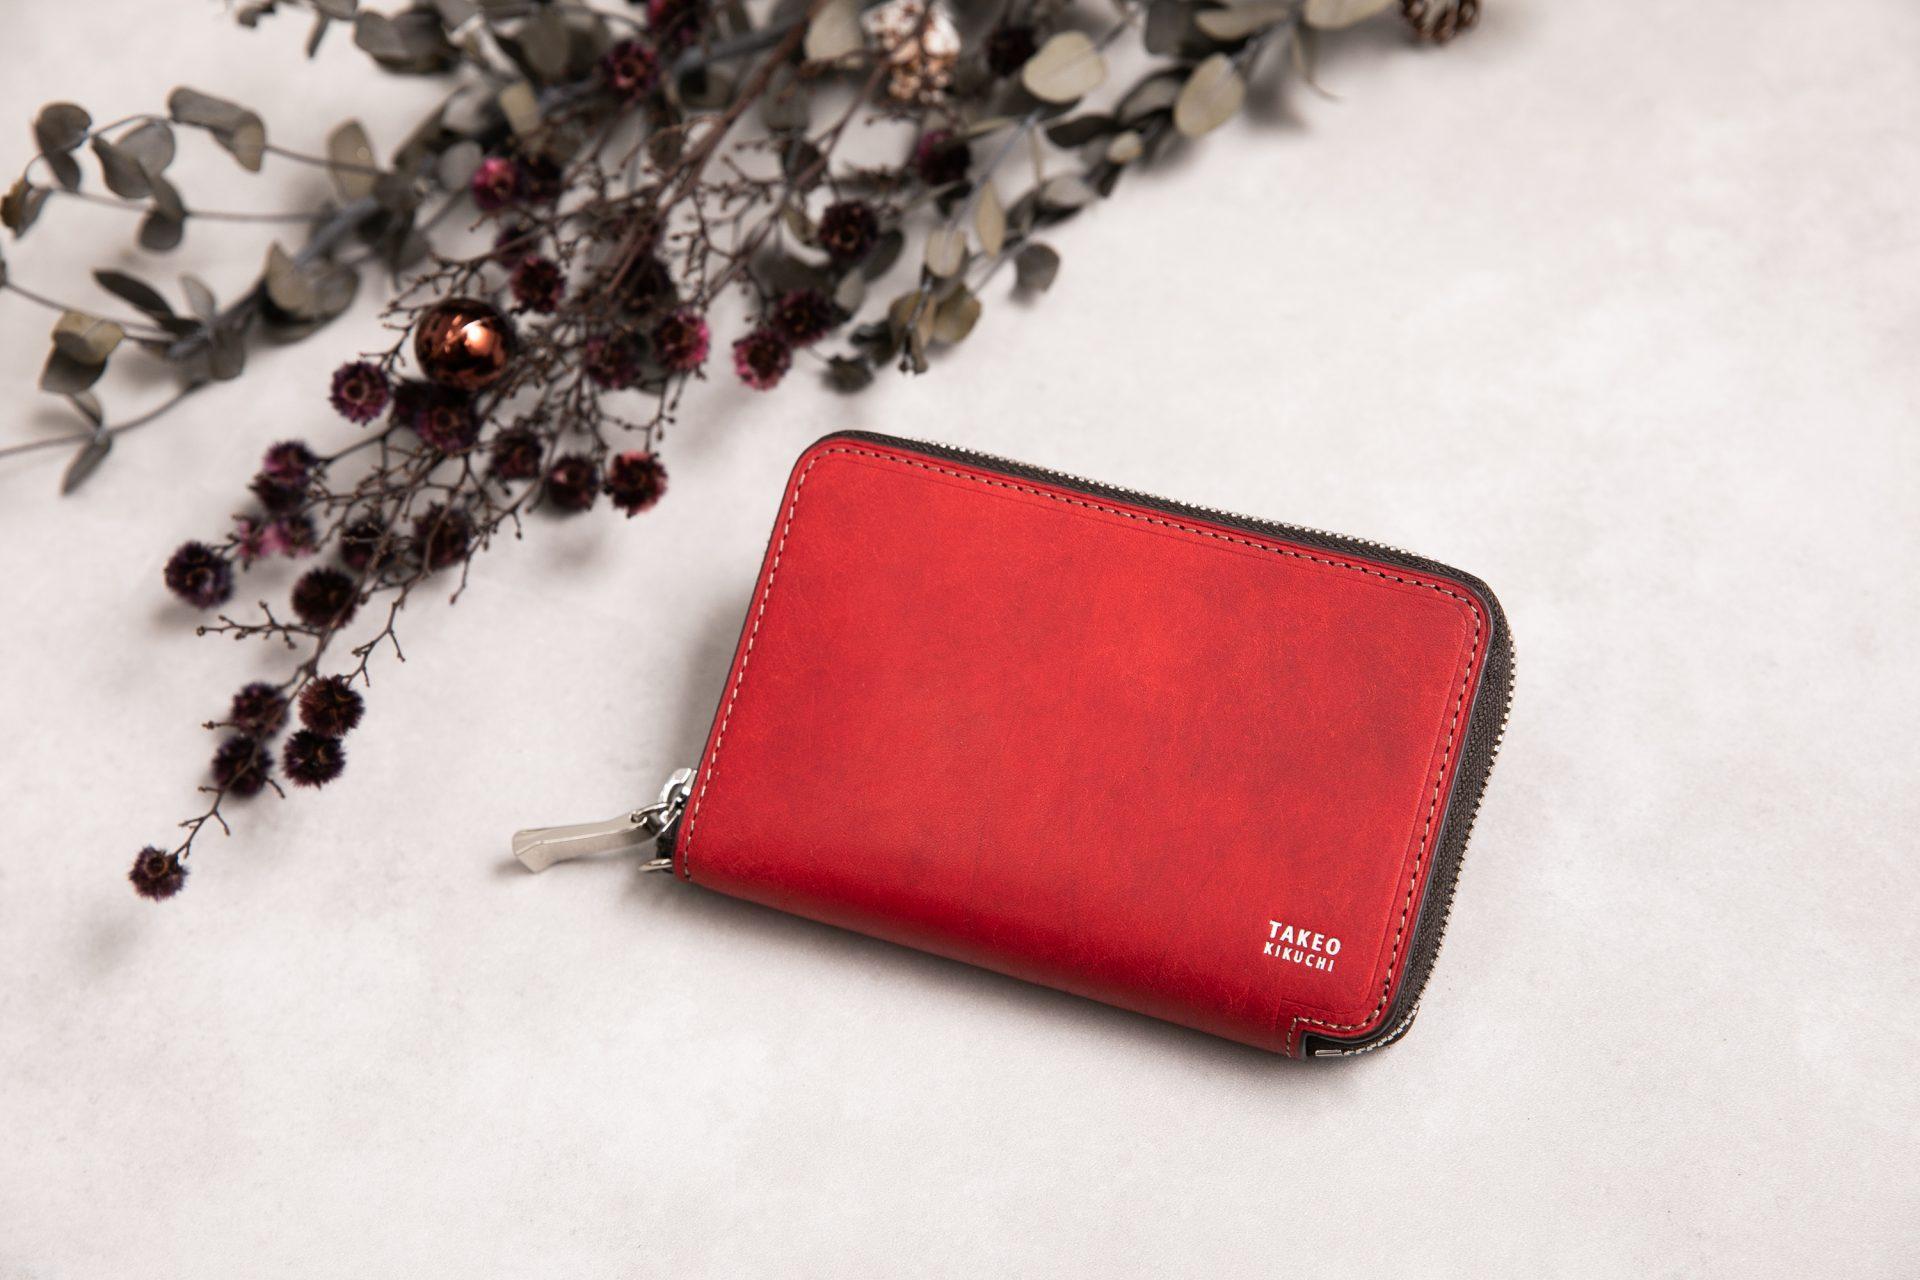 「TAKEO KIKUCHI(タケオキクチ)」で人気の財布は?実店舗で人気の財布や評判の財布などをご紹介します!